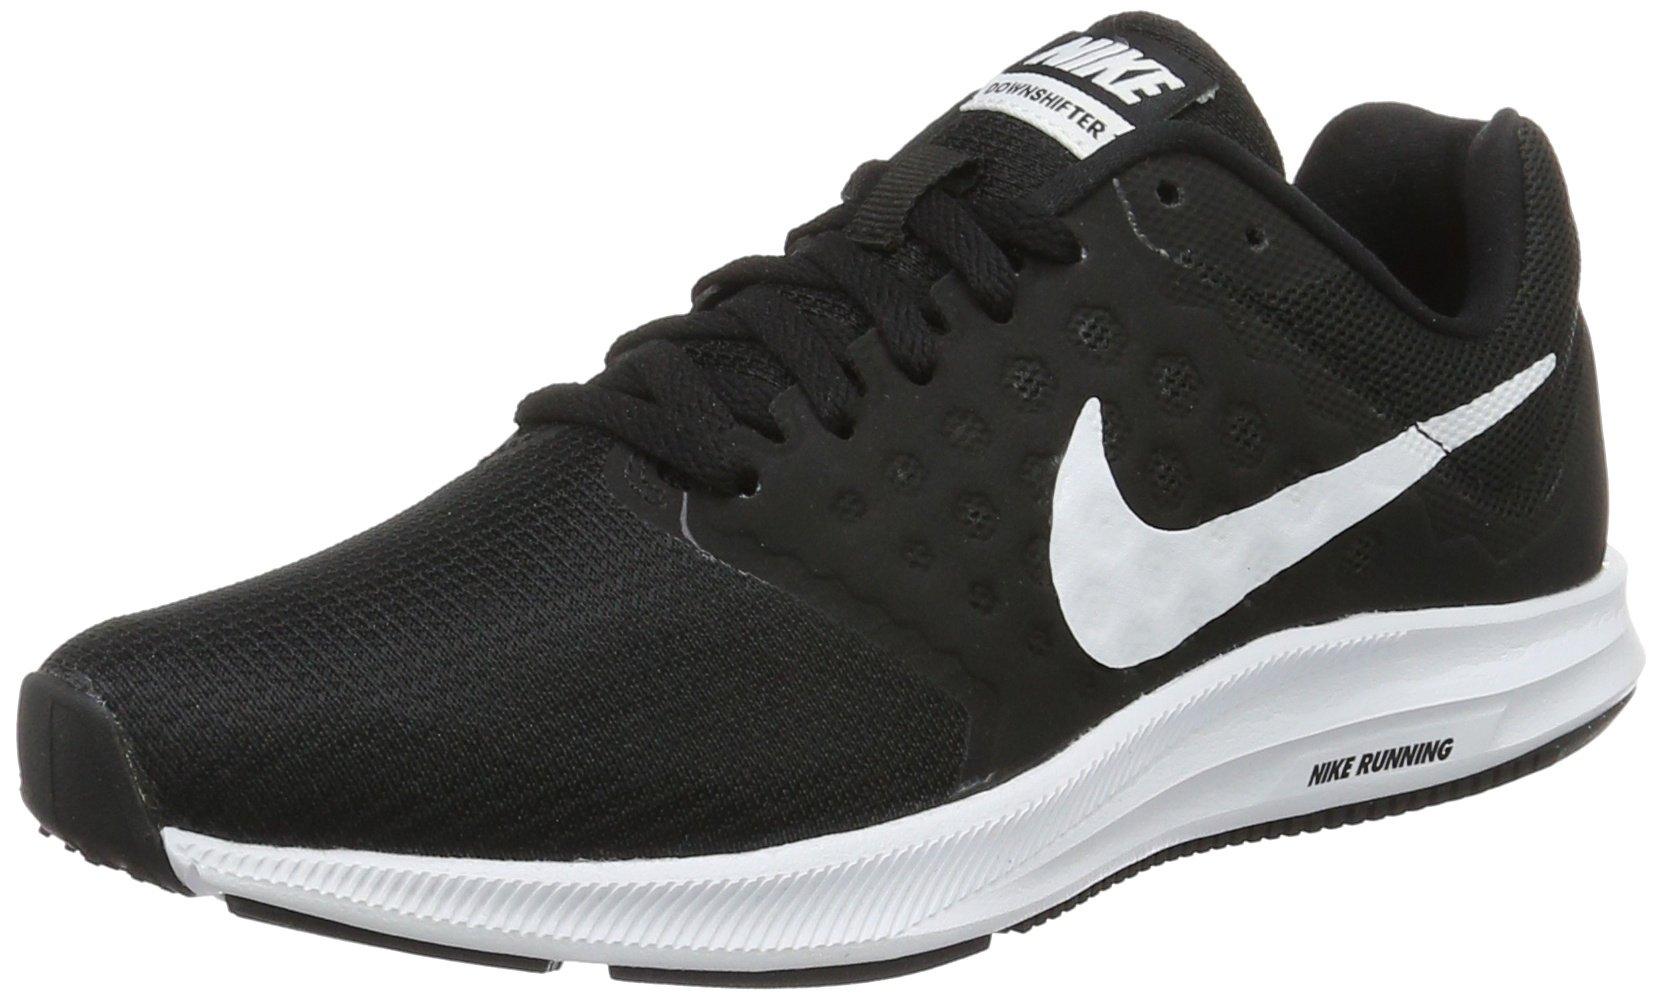 Nike Women's WMNS Downshifter 7 Running